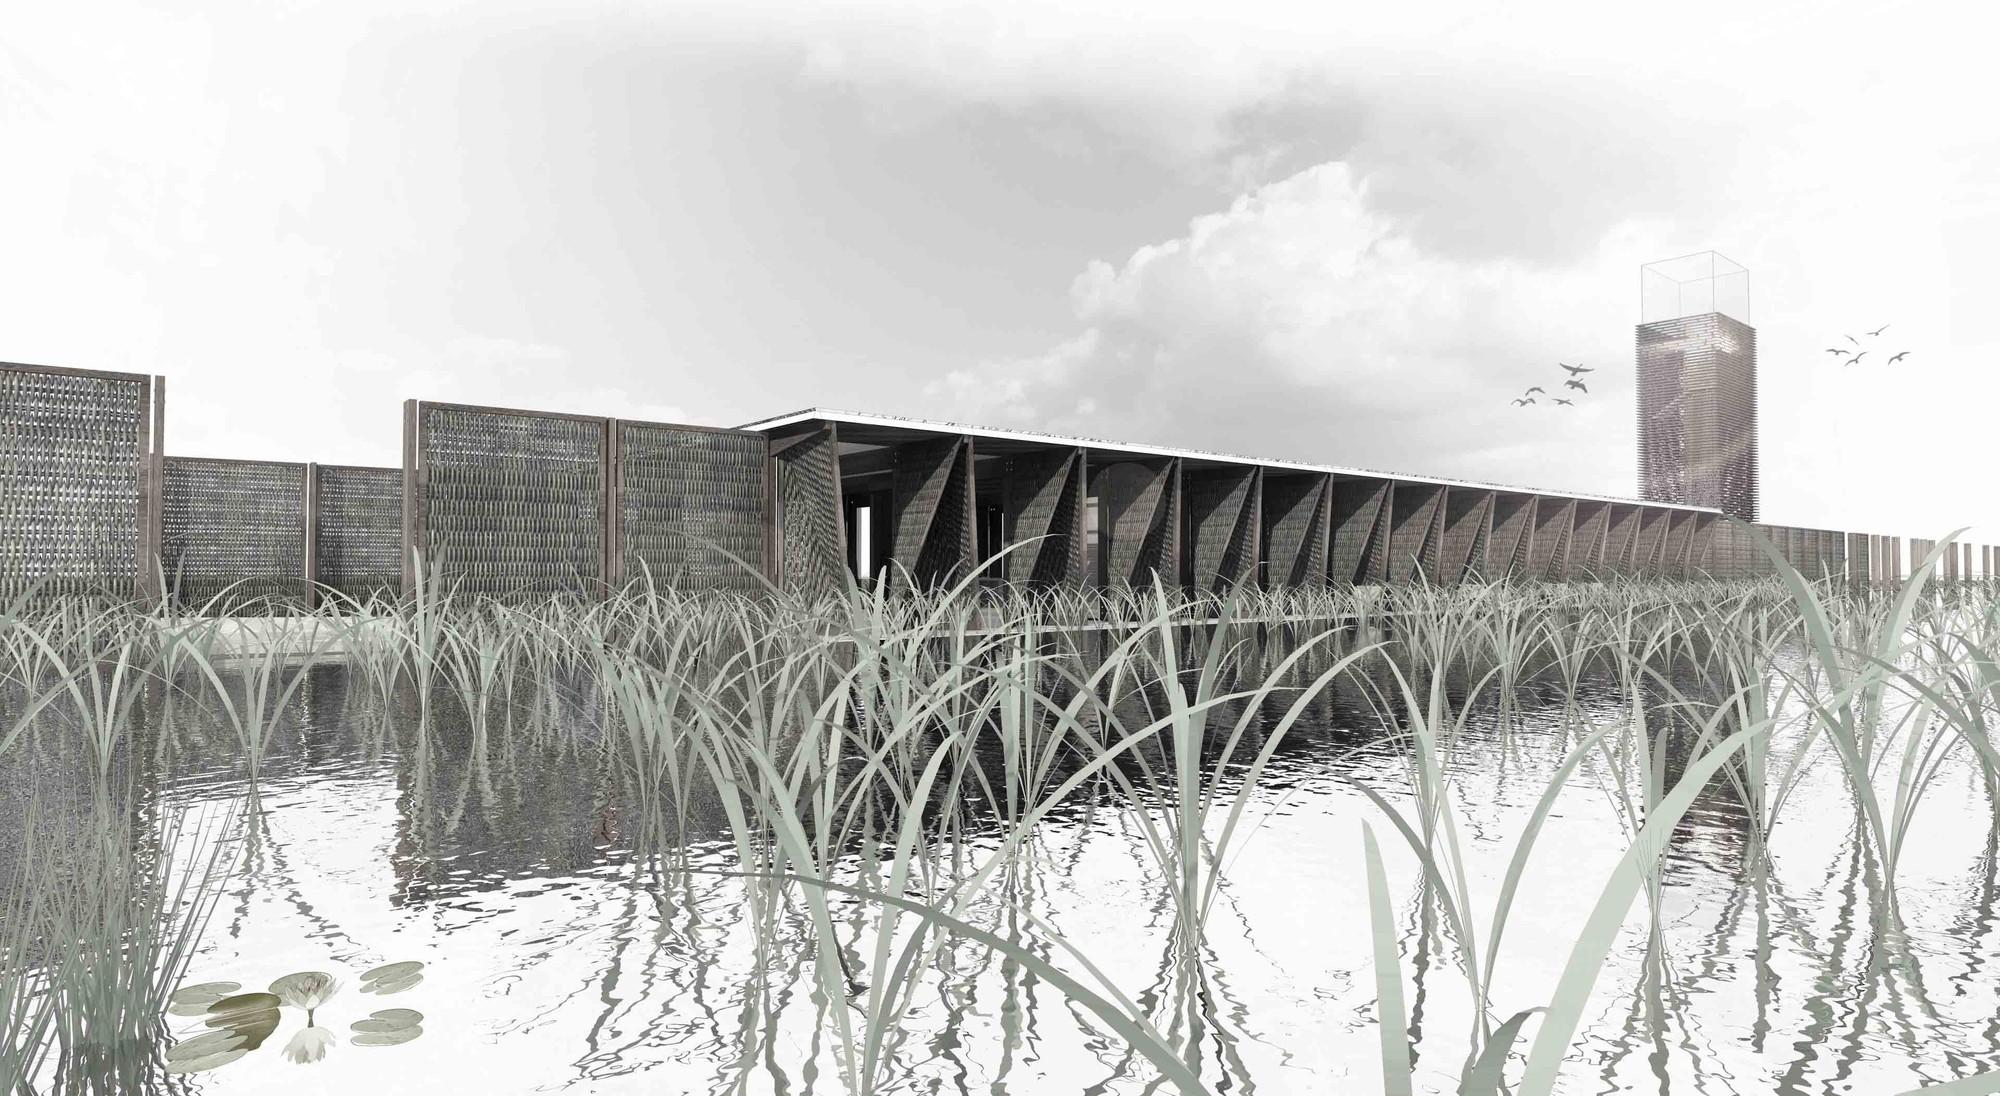 Courtesy of Nicholas Hare Architects